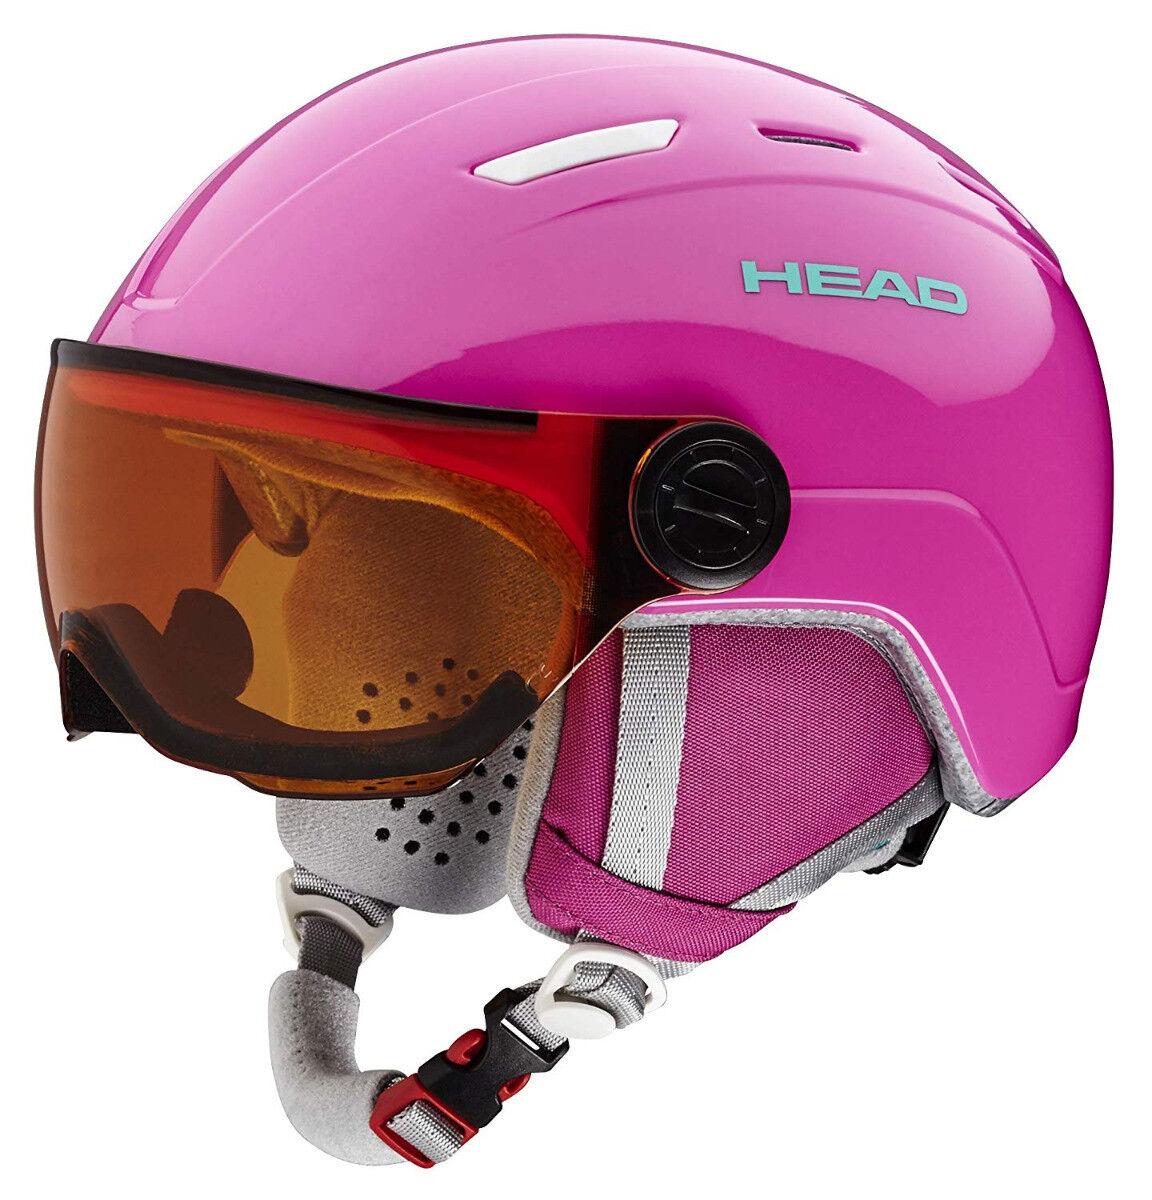 Head Maja Visor ski Snowboard Winter Sports Helmet with lens   visor Pink  new